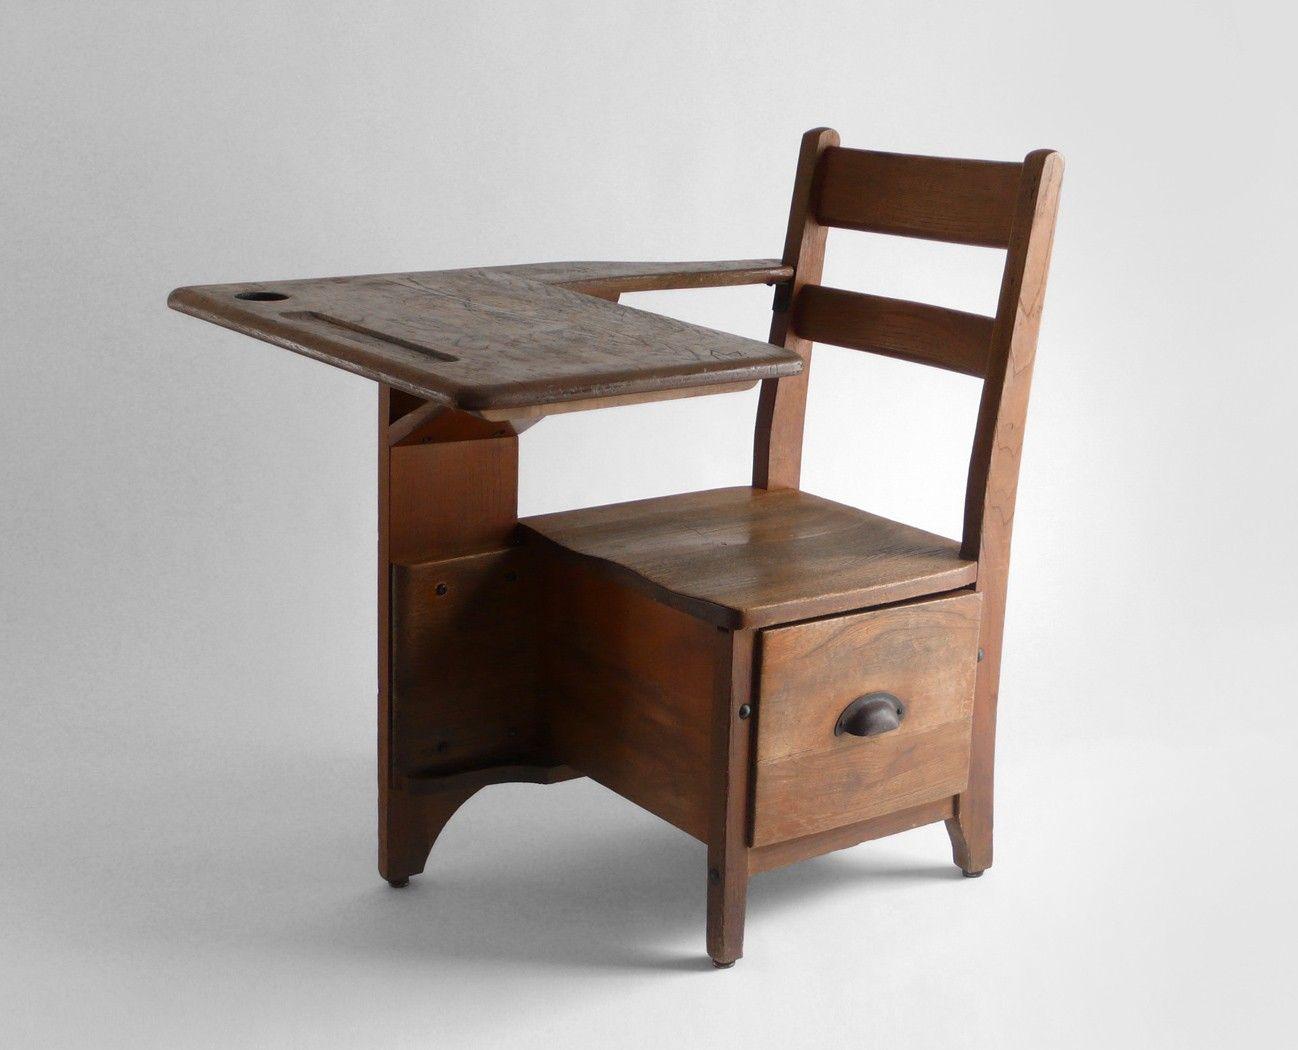 Pin By Tricia Roux On Bench Chair Sofa Stool Old School Desks Vintage School Desk Antique School Desk